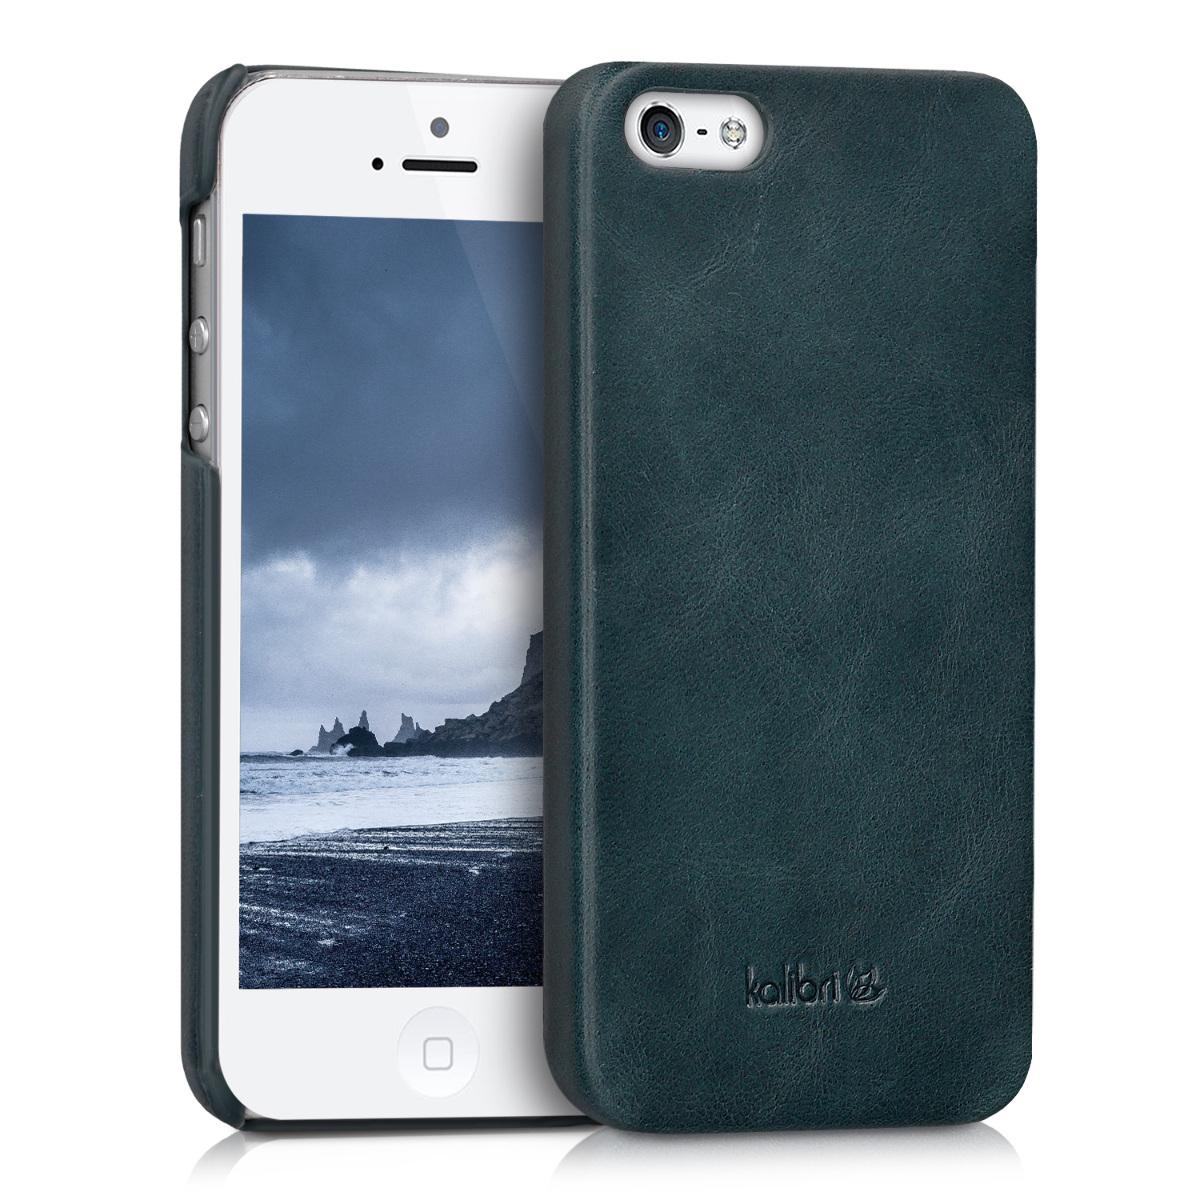 Kalibri Σκληρή Δερμάτινη Θήκη iPhone SE / 5S / 5 - Dark Blue (38962.17)